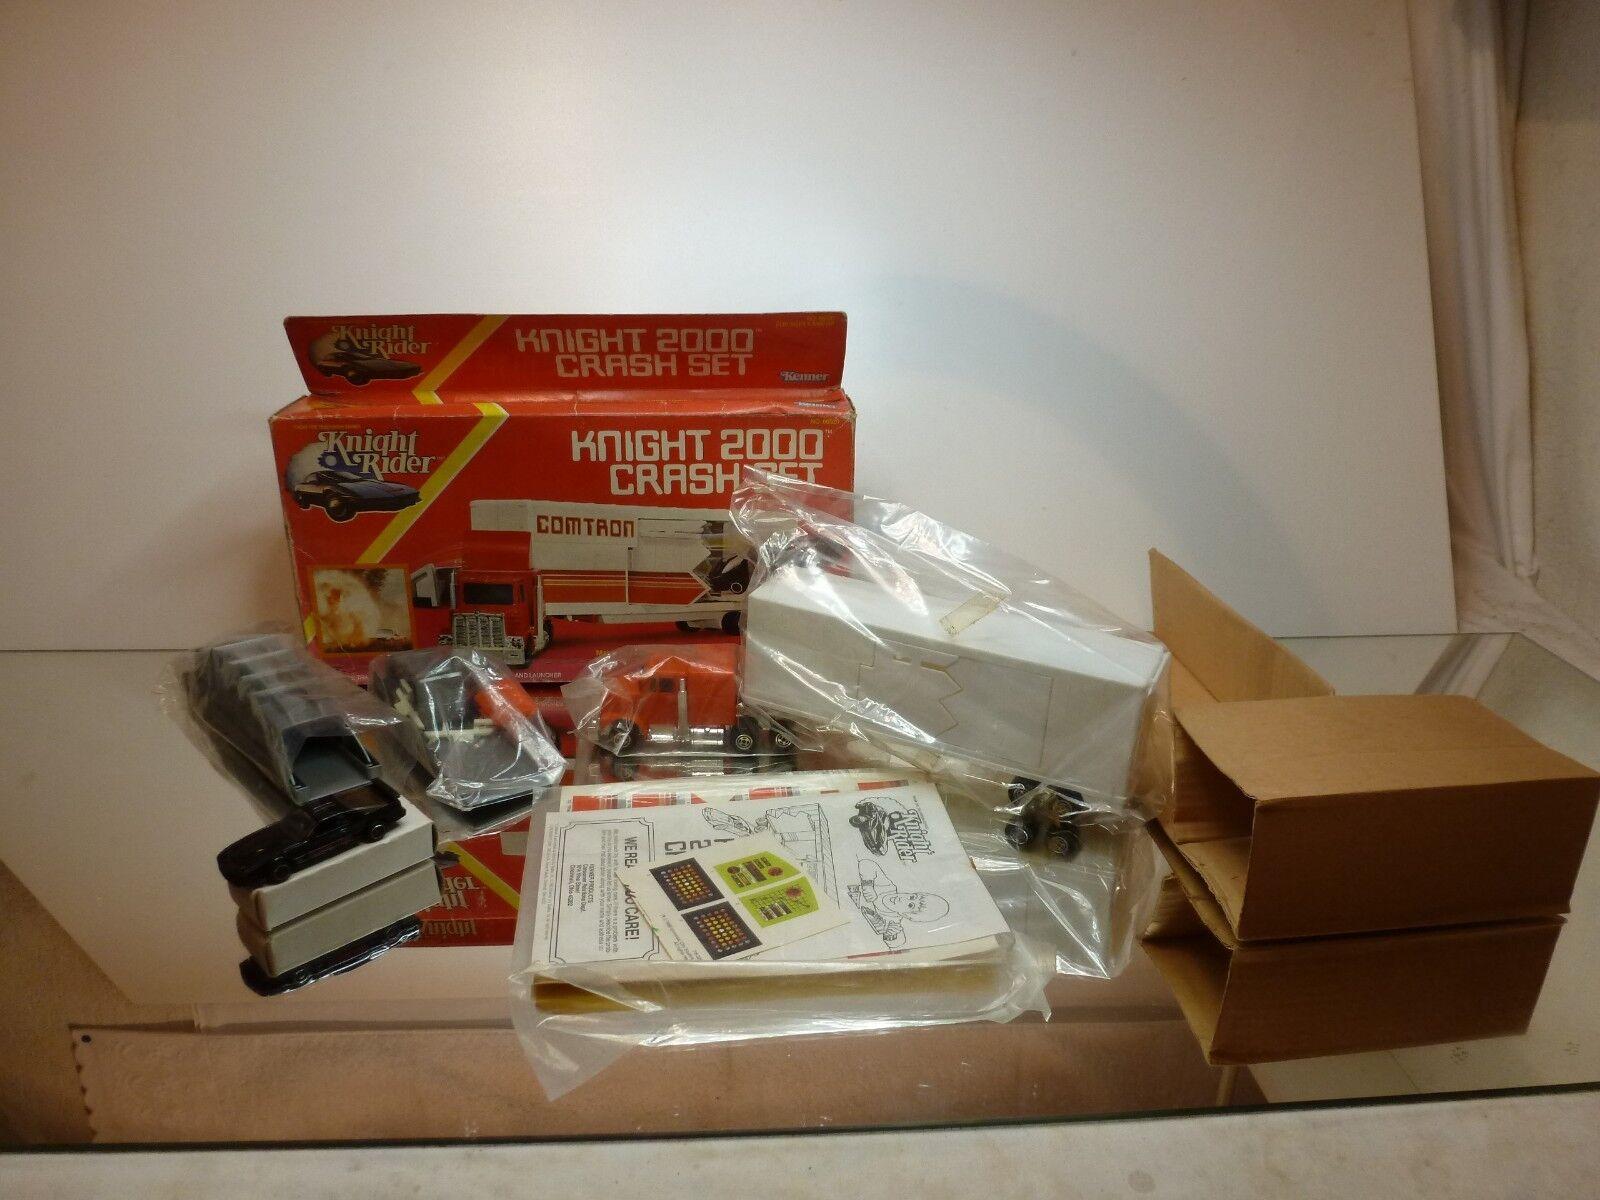 KENNER 66520 KNIGHT 2000 CRASH CRASH CRASH SET - KITT - COMTRON - VERY RARE - GOOD IN BOX a29d4b